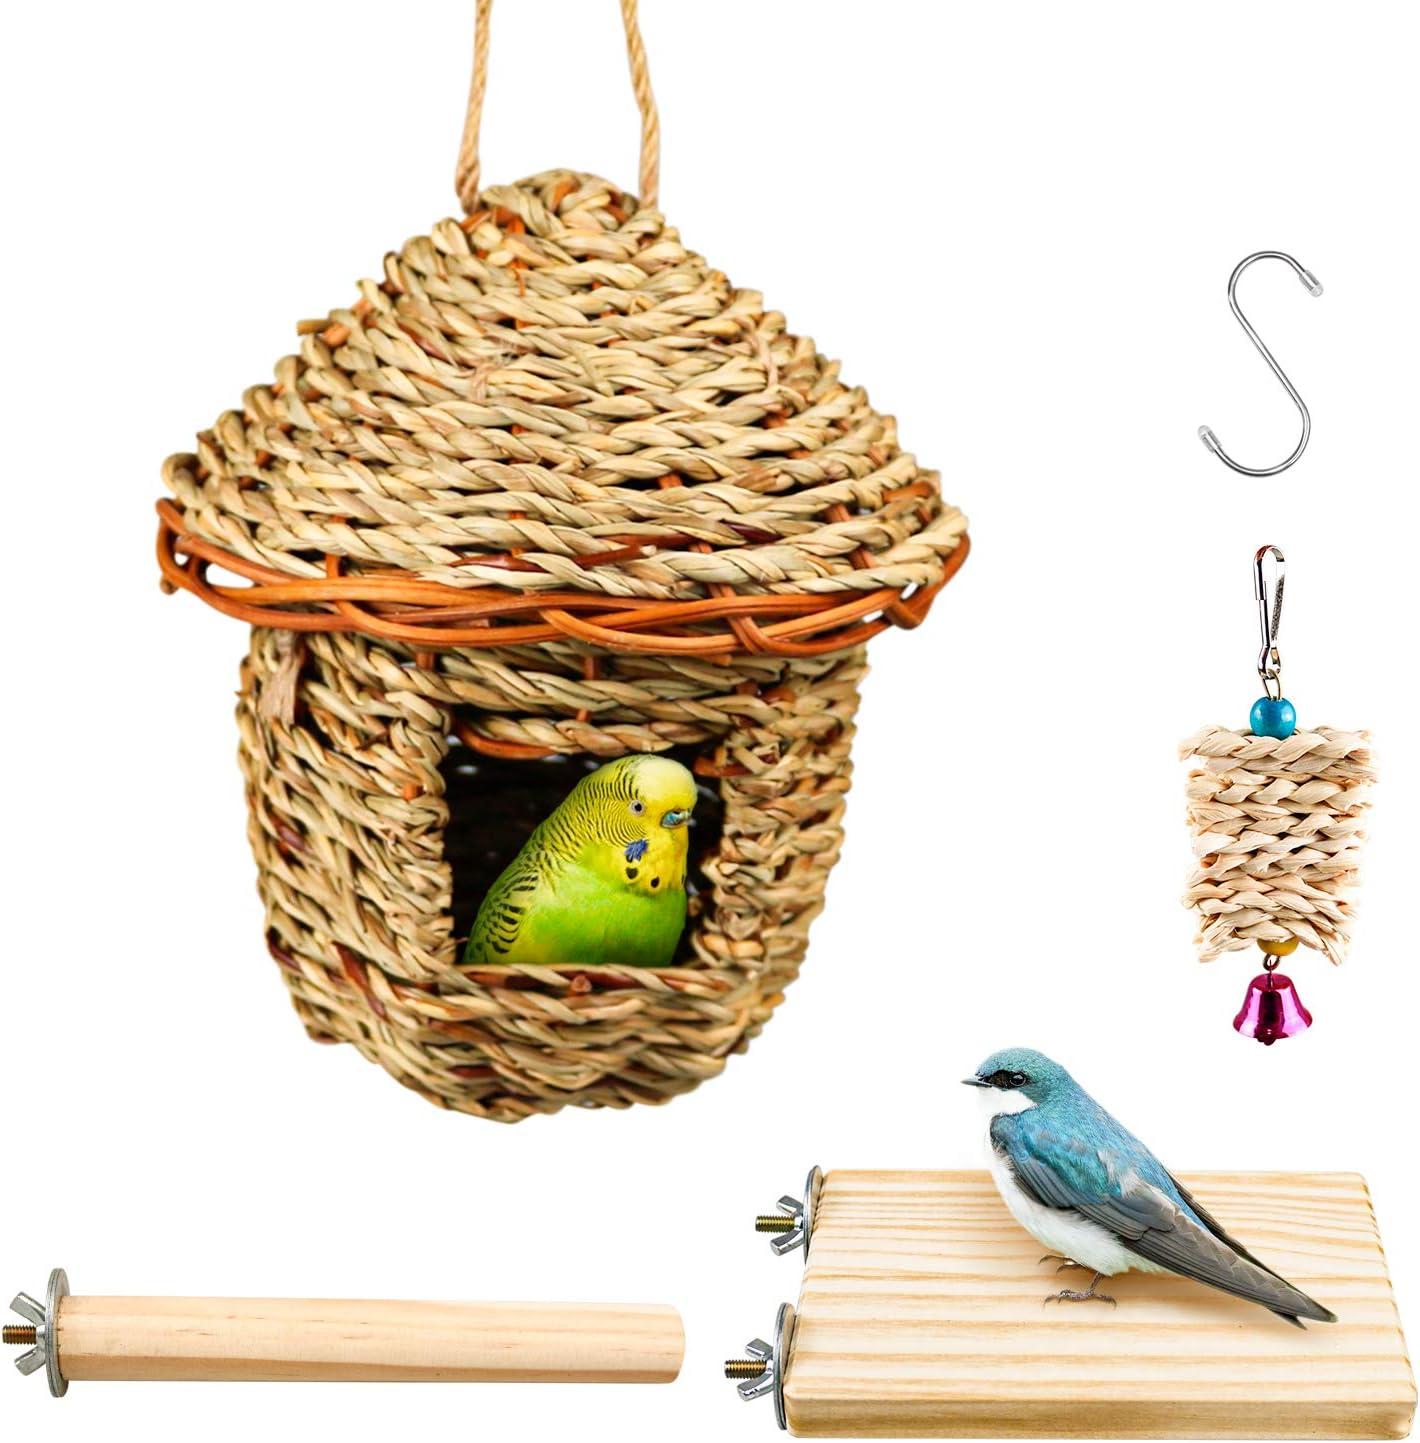 S-Mechanic Hummingbird Bird Nest 2021 new Handwoven Portland Mall Hanging Grass B Straw